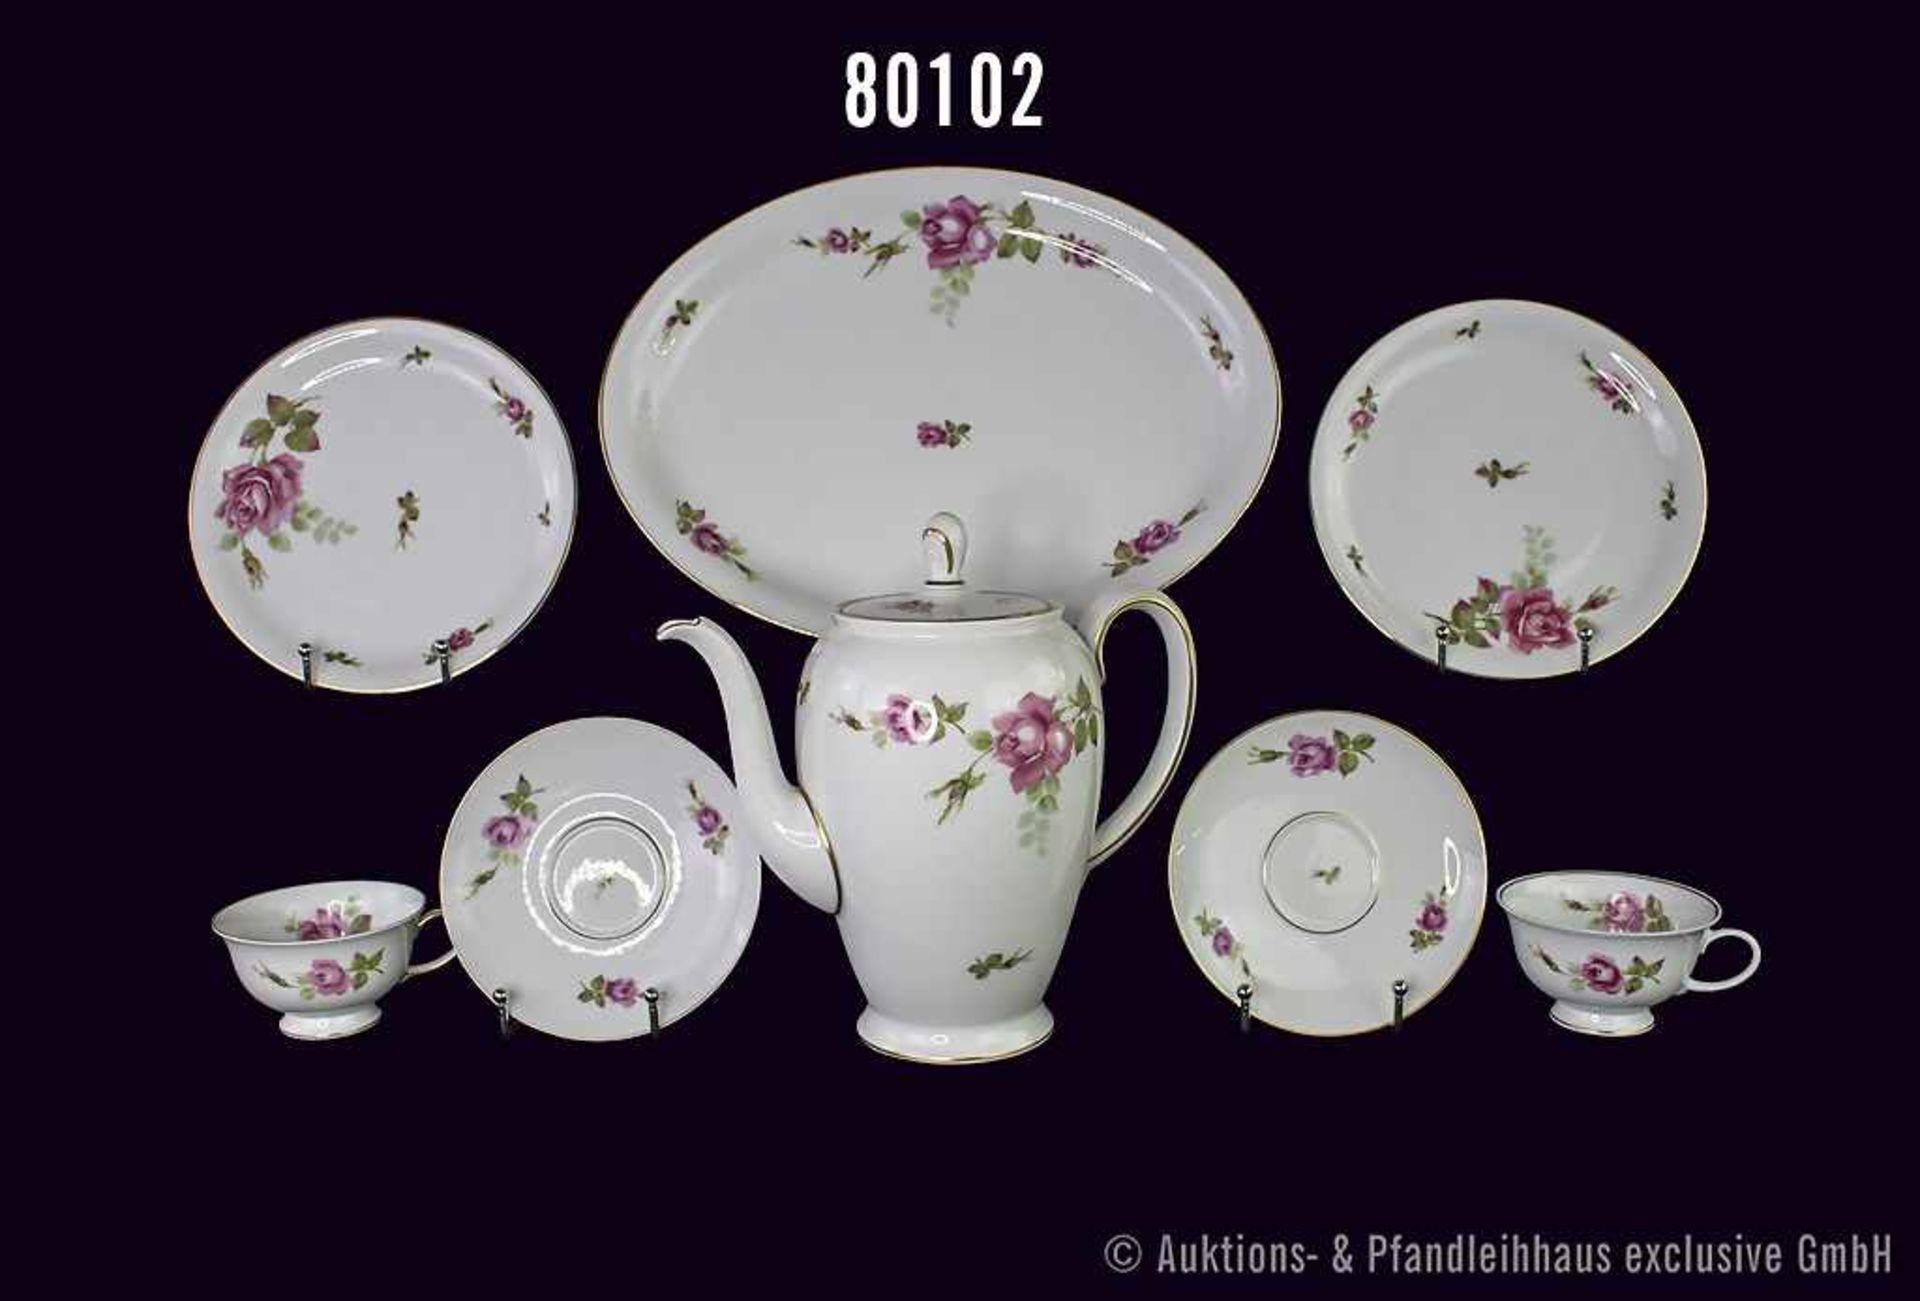 Konv. 32 Teile Rosenthal Porzellan, Serie AIDA, Dekor Rote Rose mit Goldrand, dabei 1 ovale Platte L